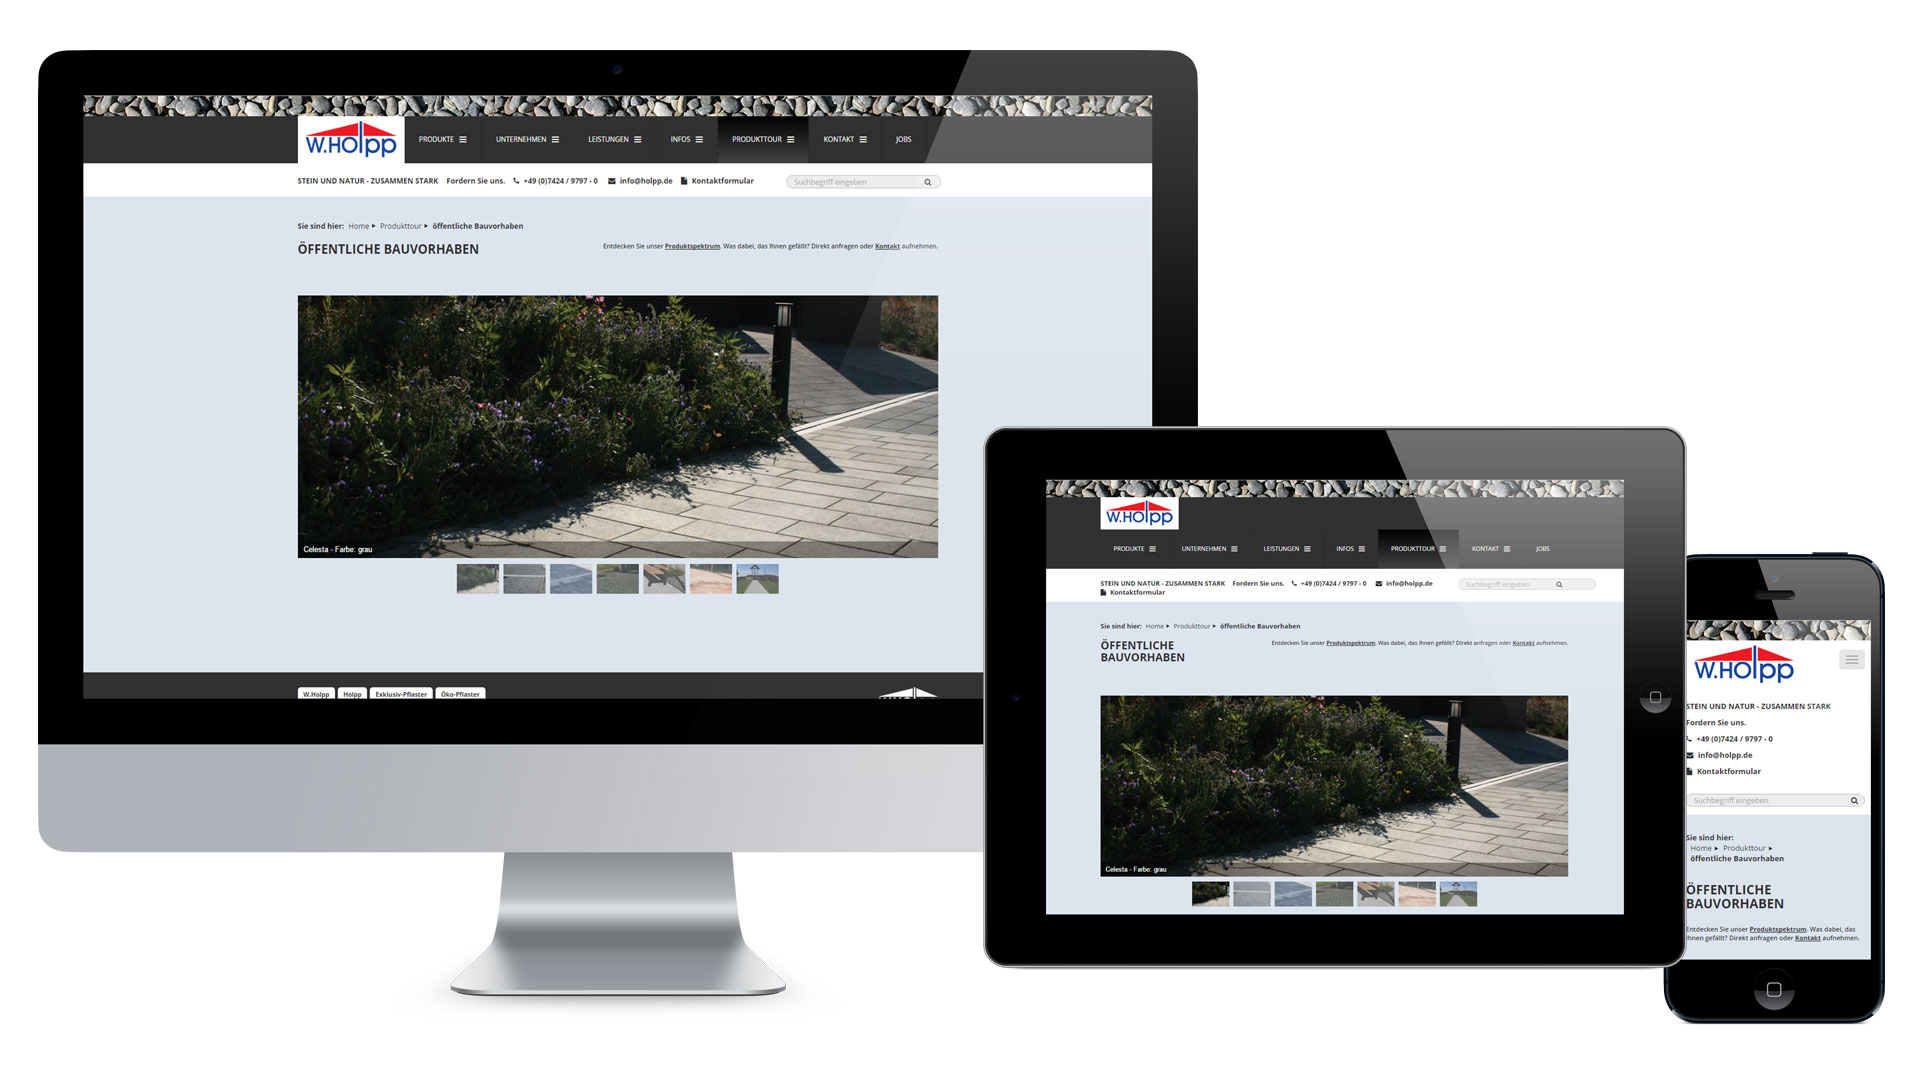 W. Holpp Betonwaren GmbH & Co. KG Web